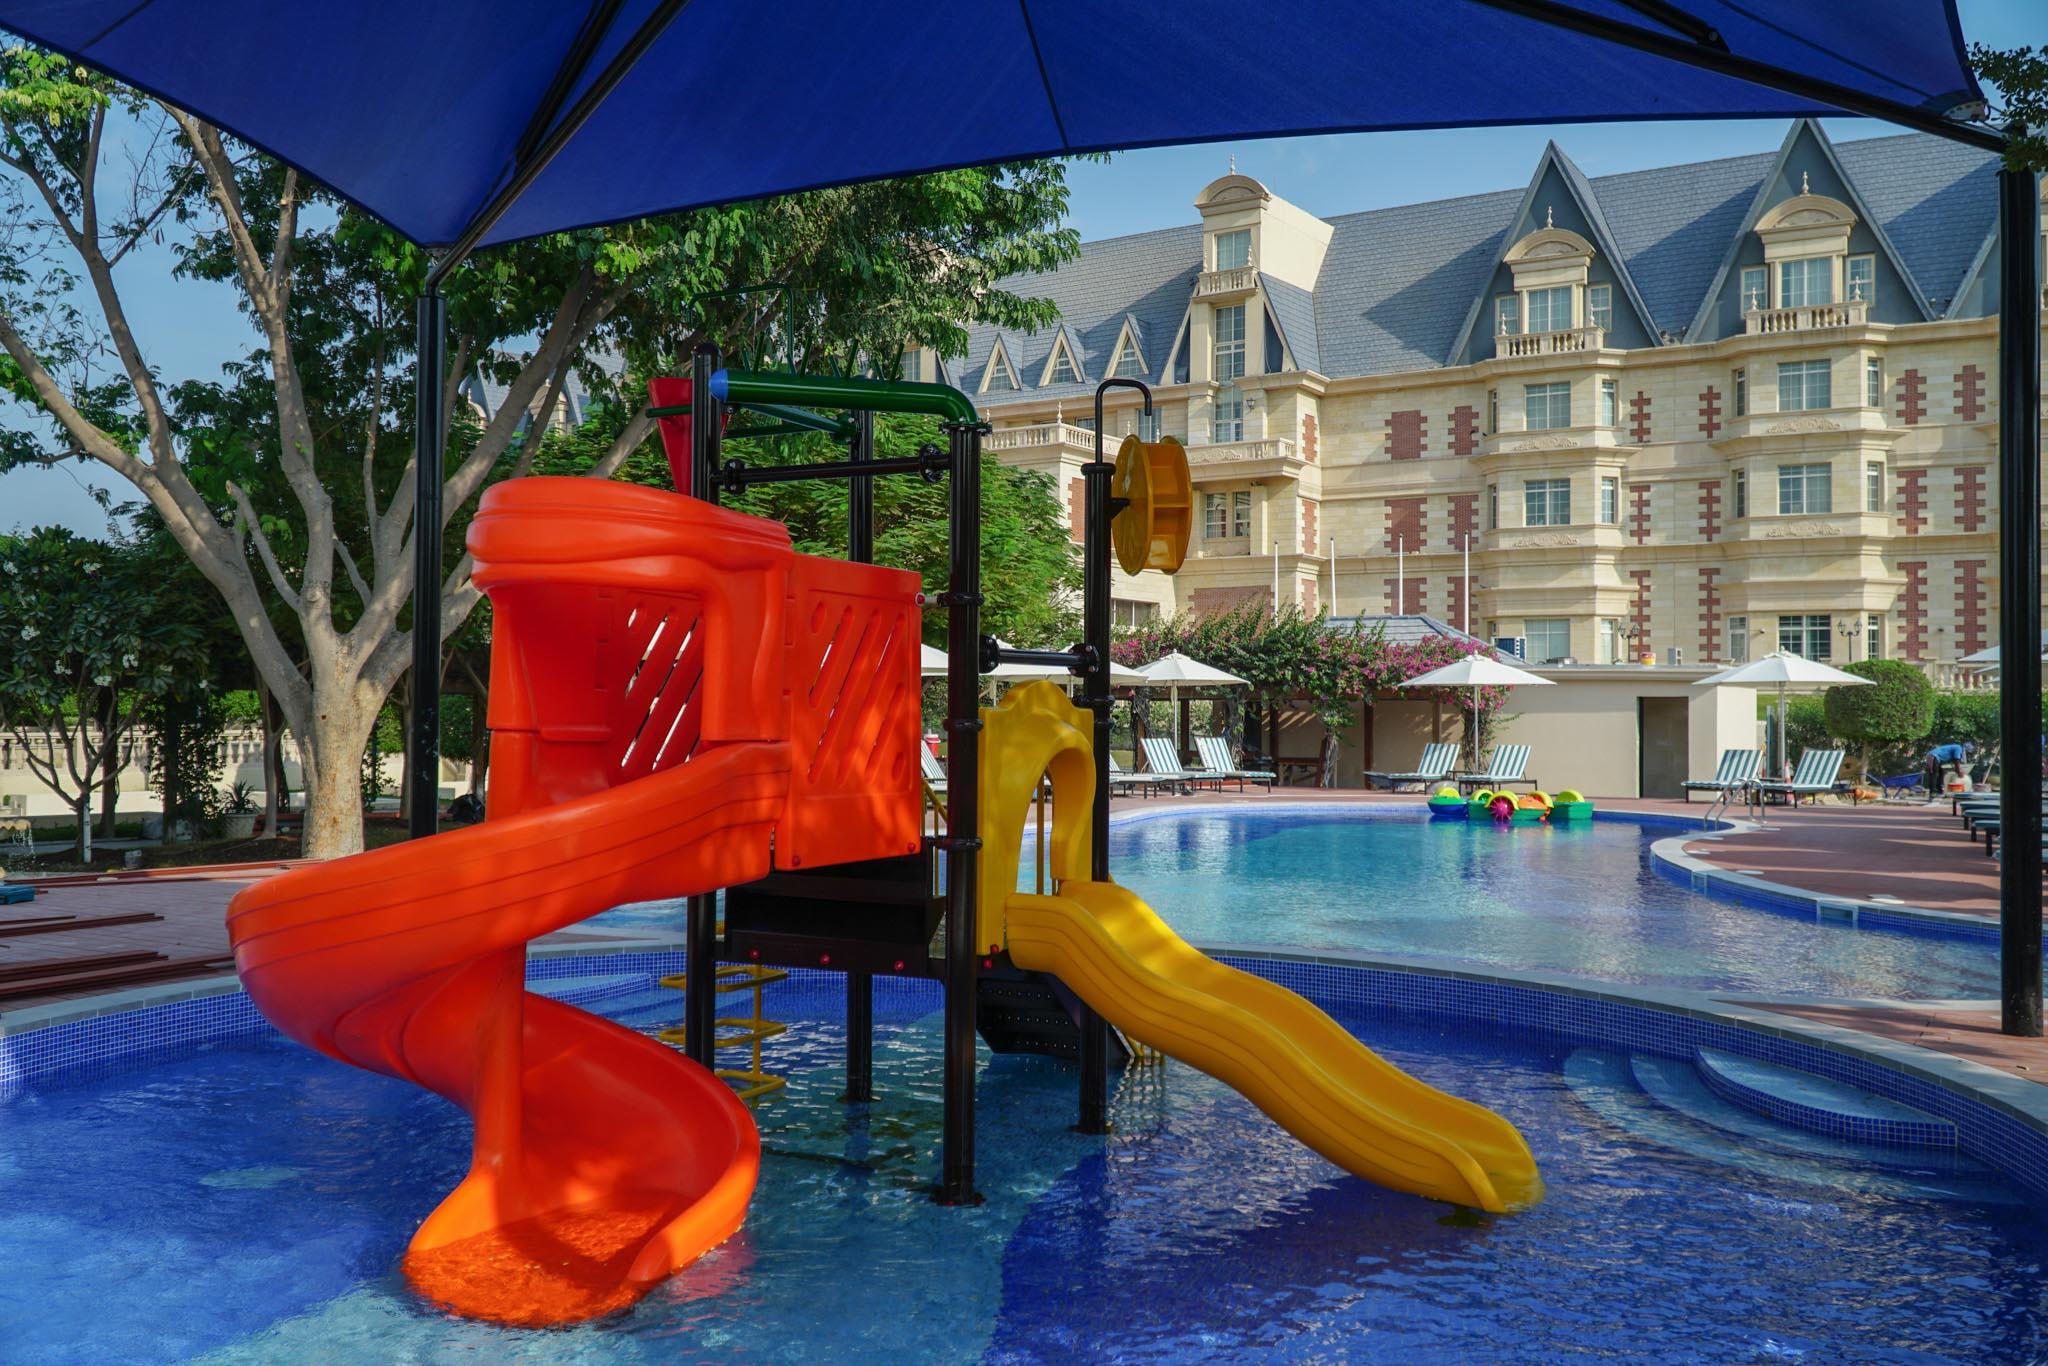 al_aziziyah_boutique_hotel_kids_pool.jpg